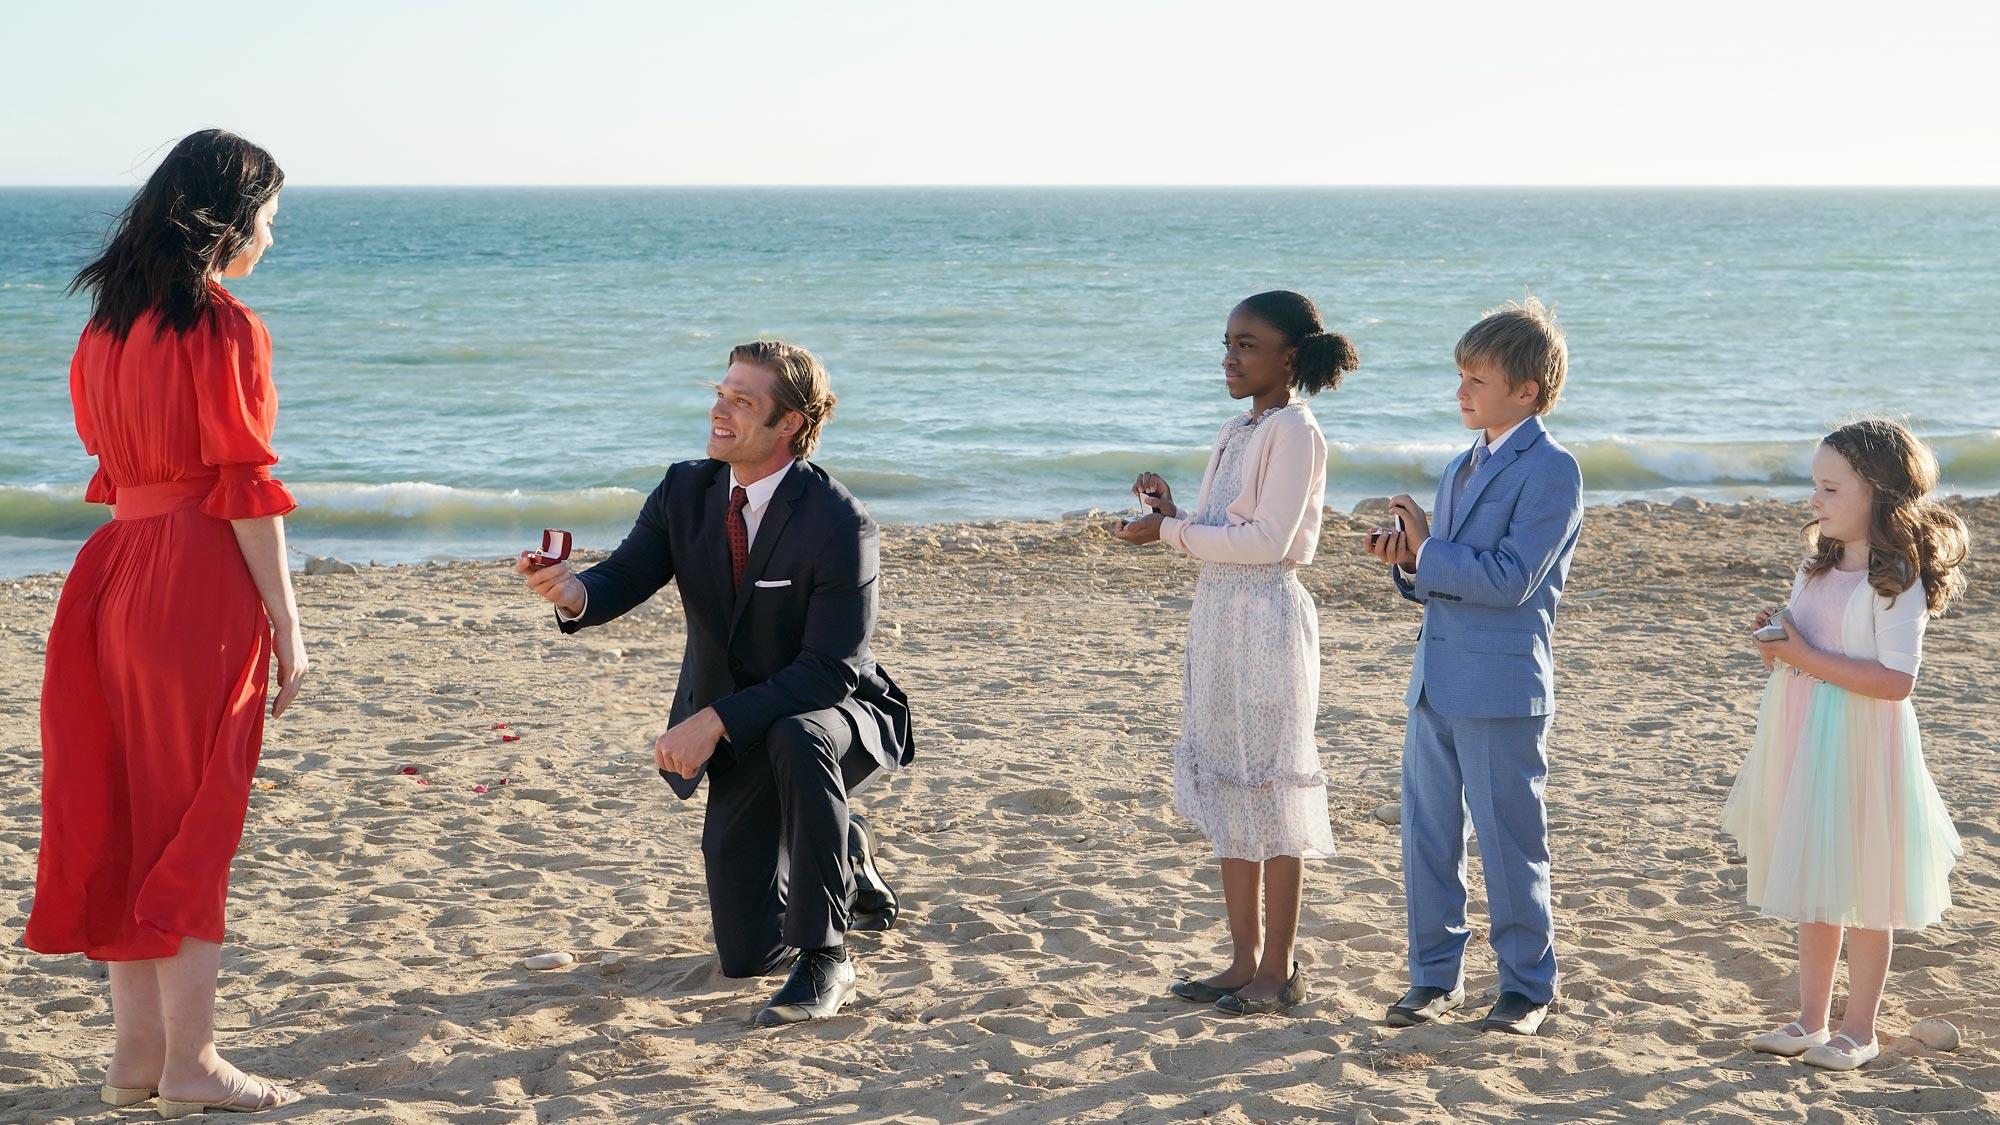 Grey's Anatomy finale: Amelia and Link